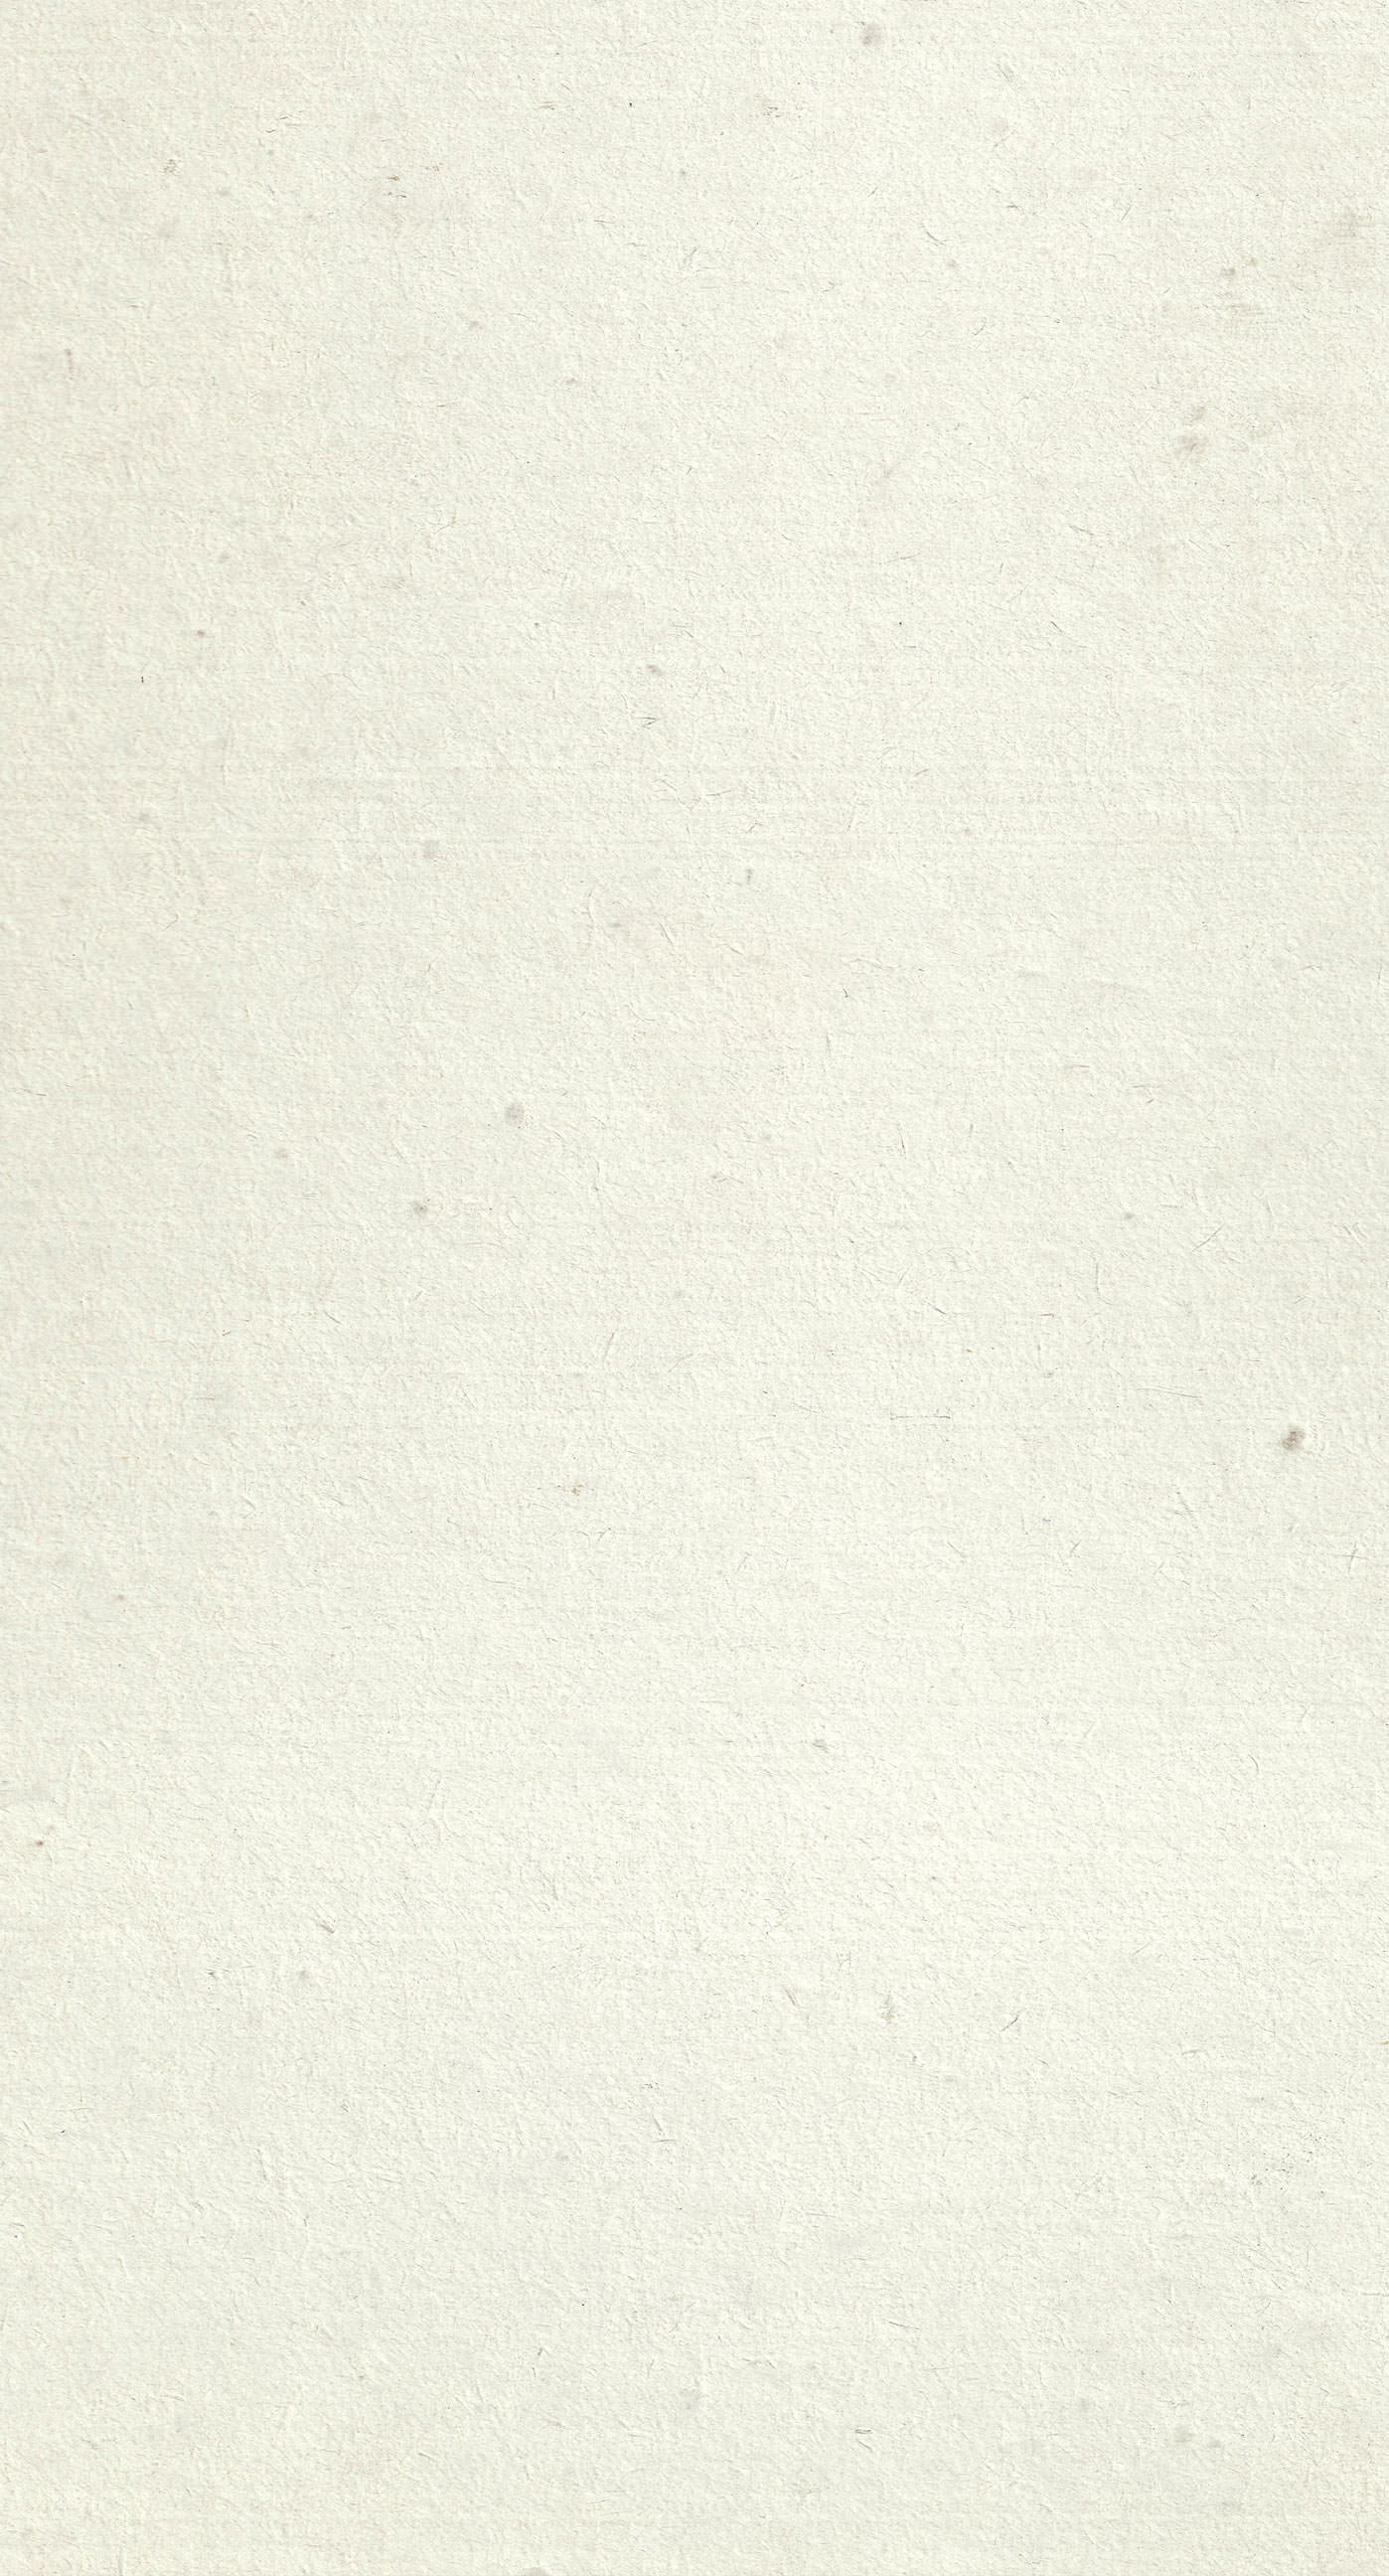 Waste Paper White Beige Wallpaper Sc Iphone8plus